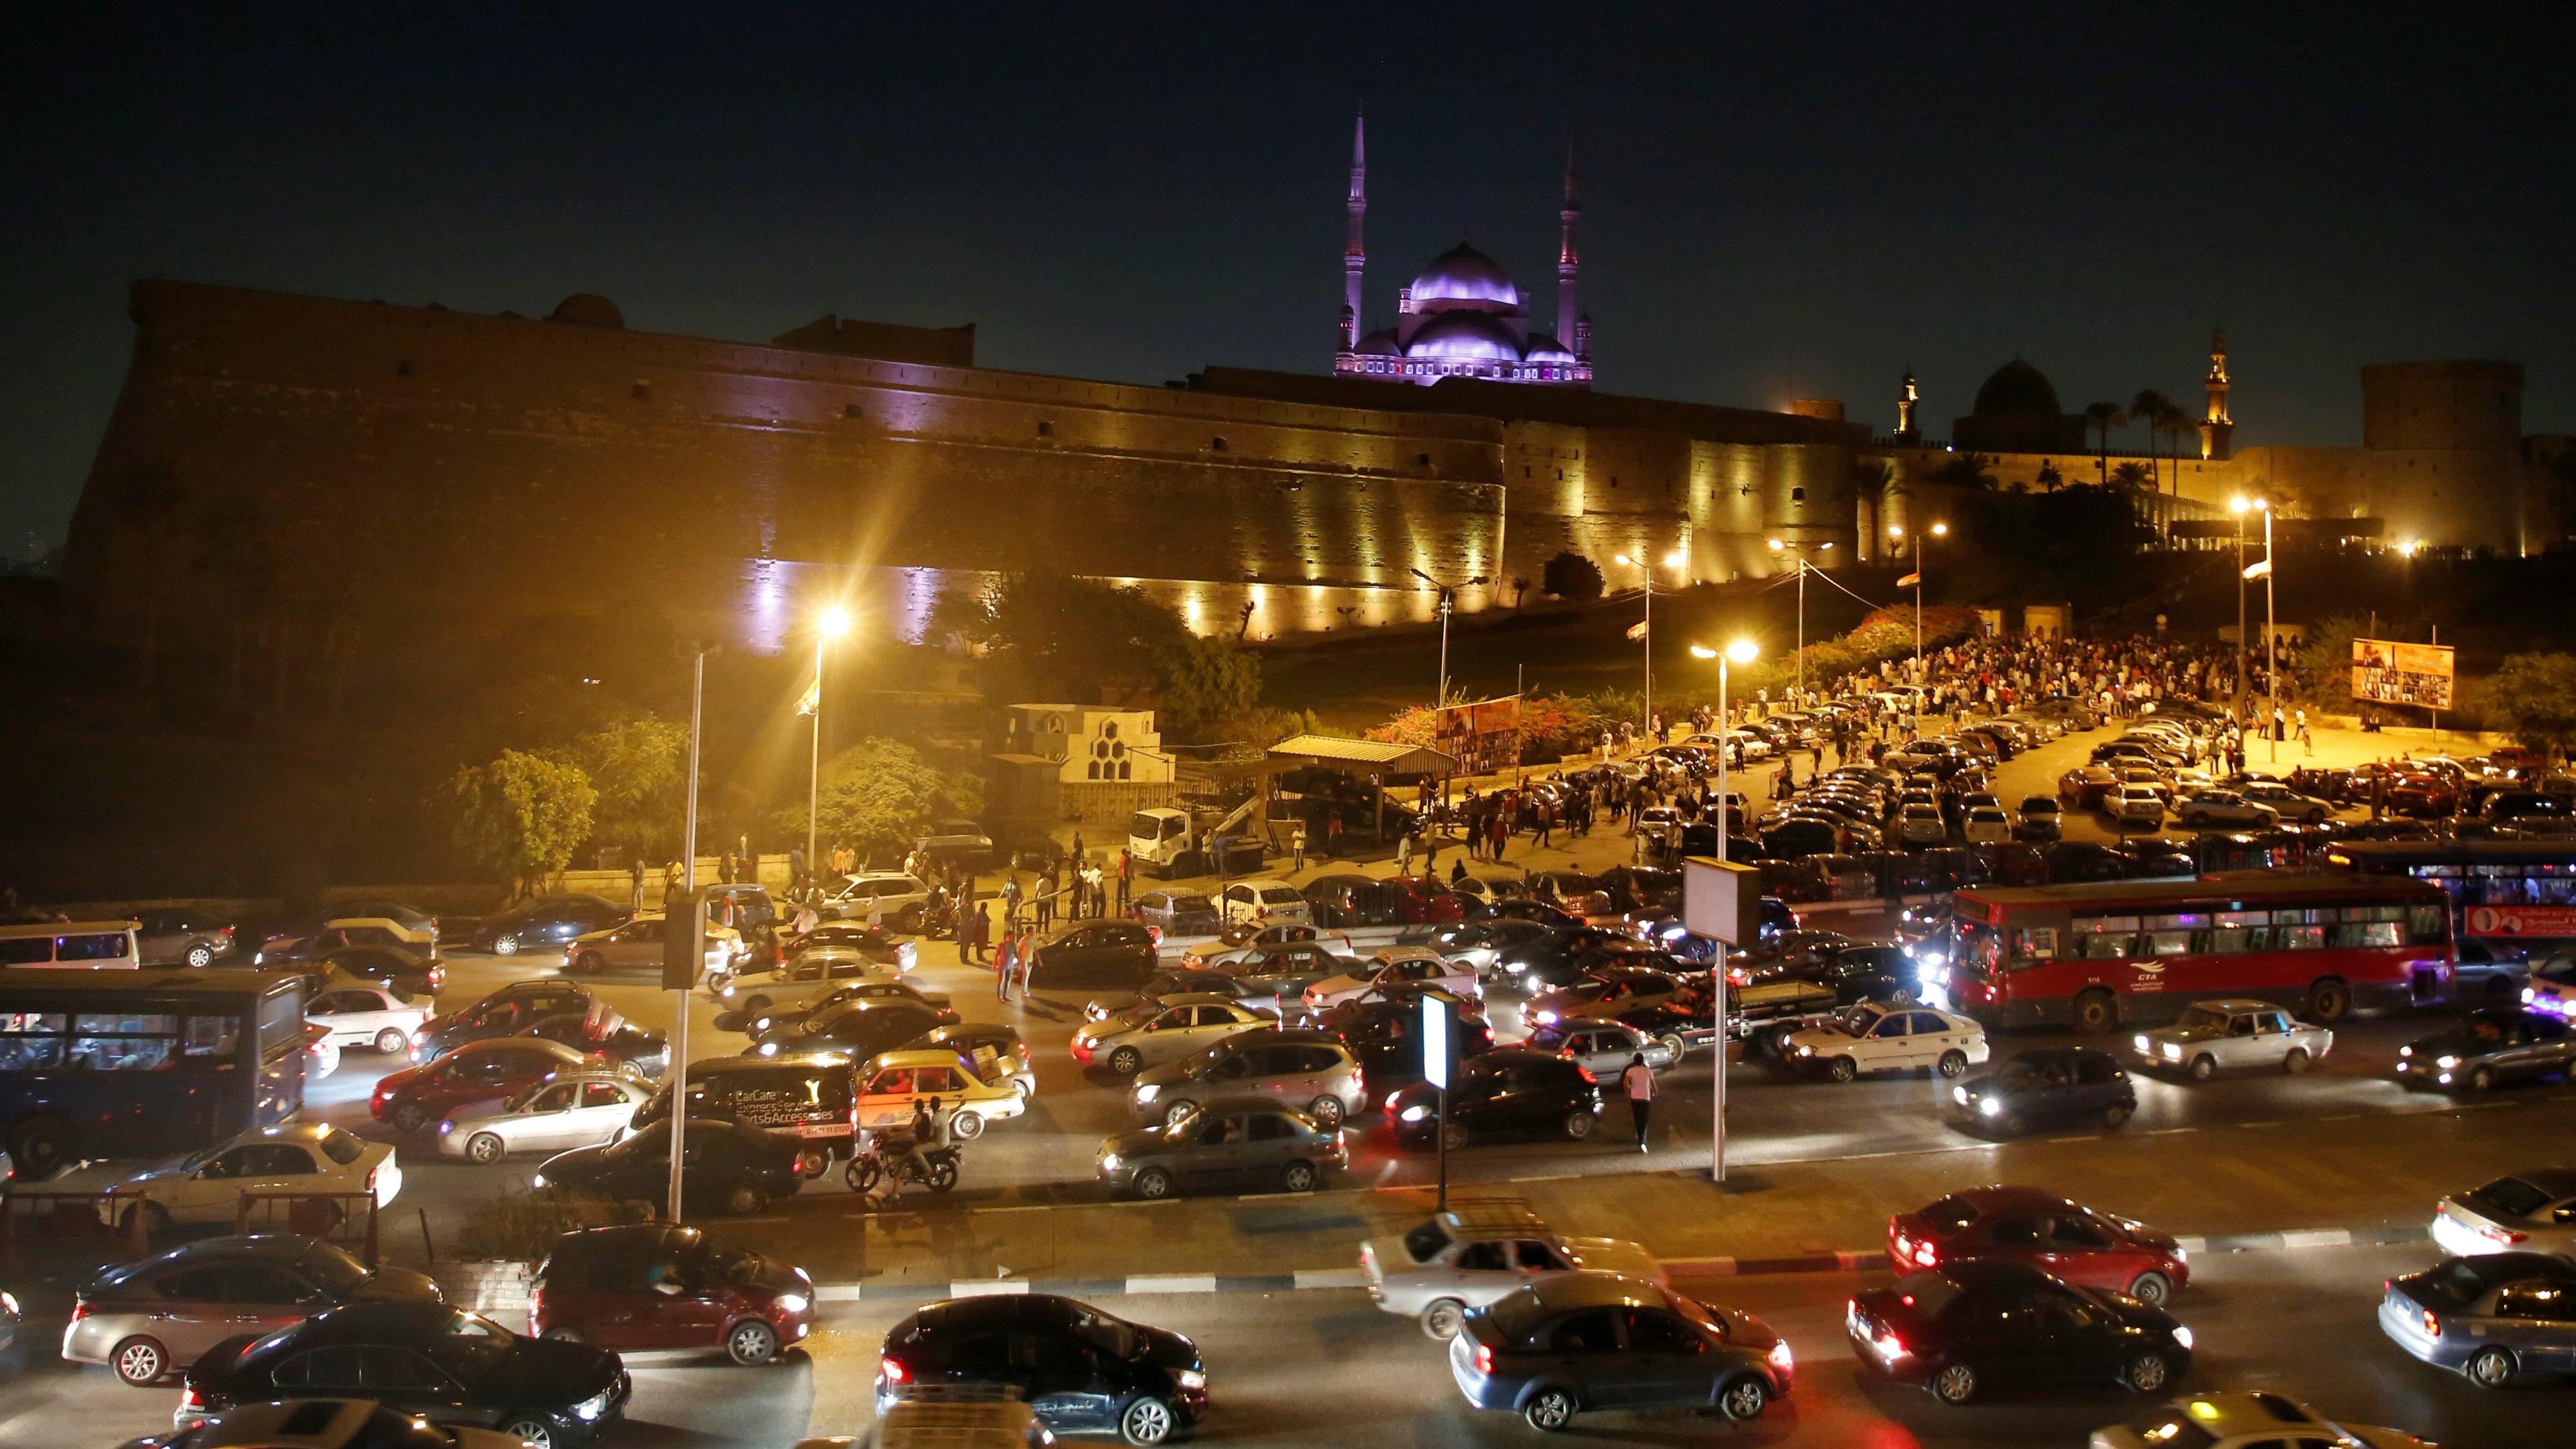 traffic-jam-in-cairo